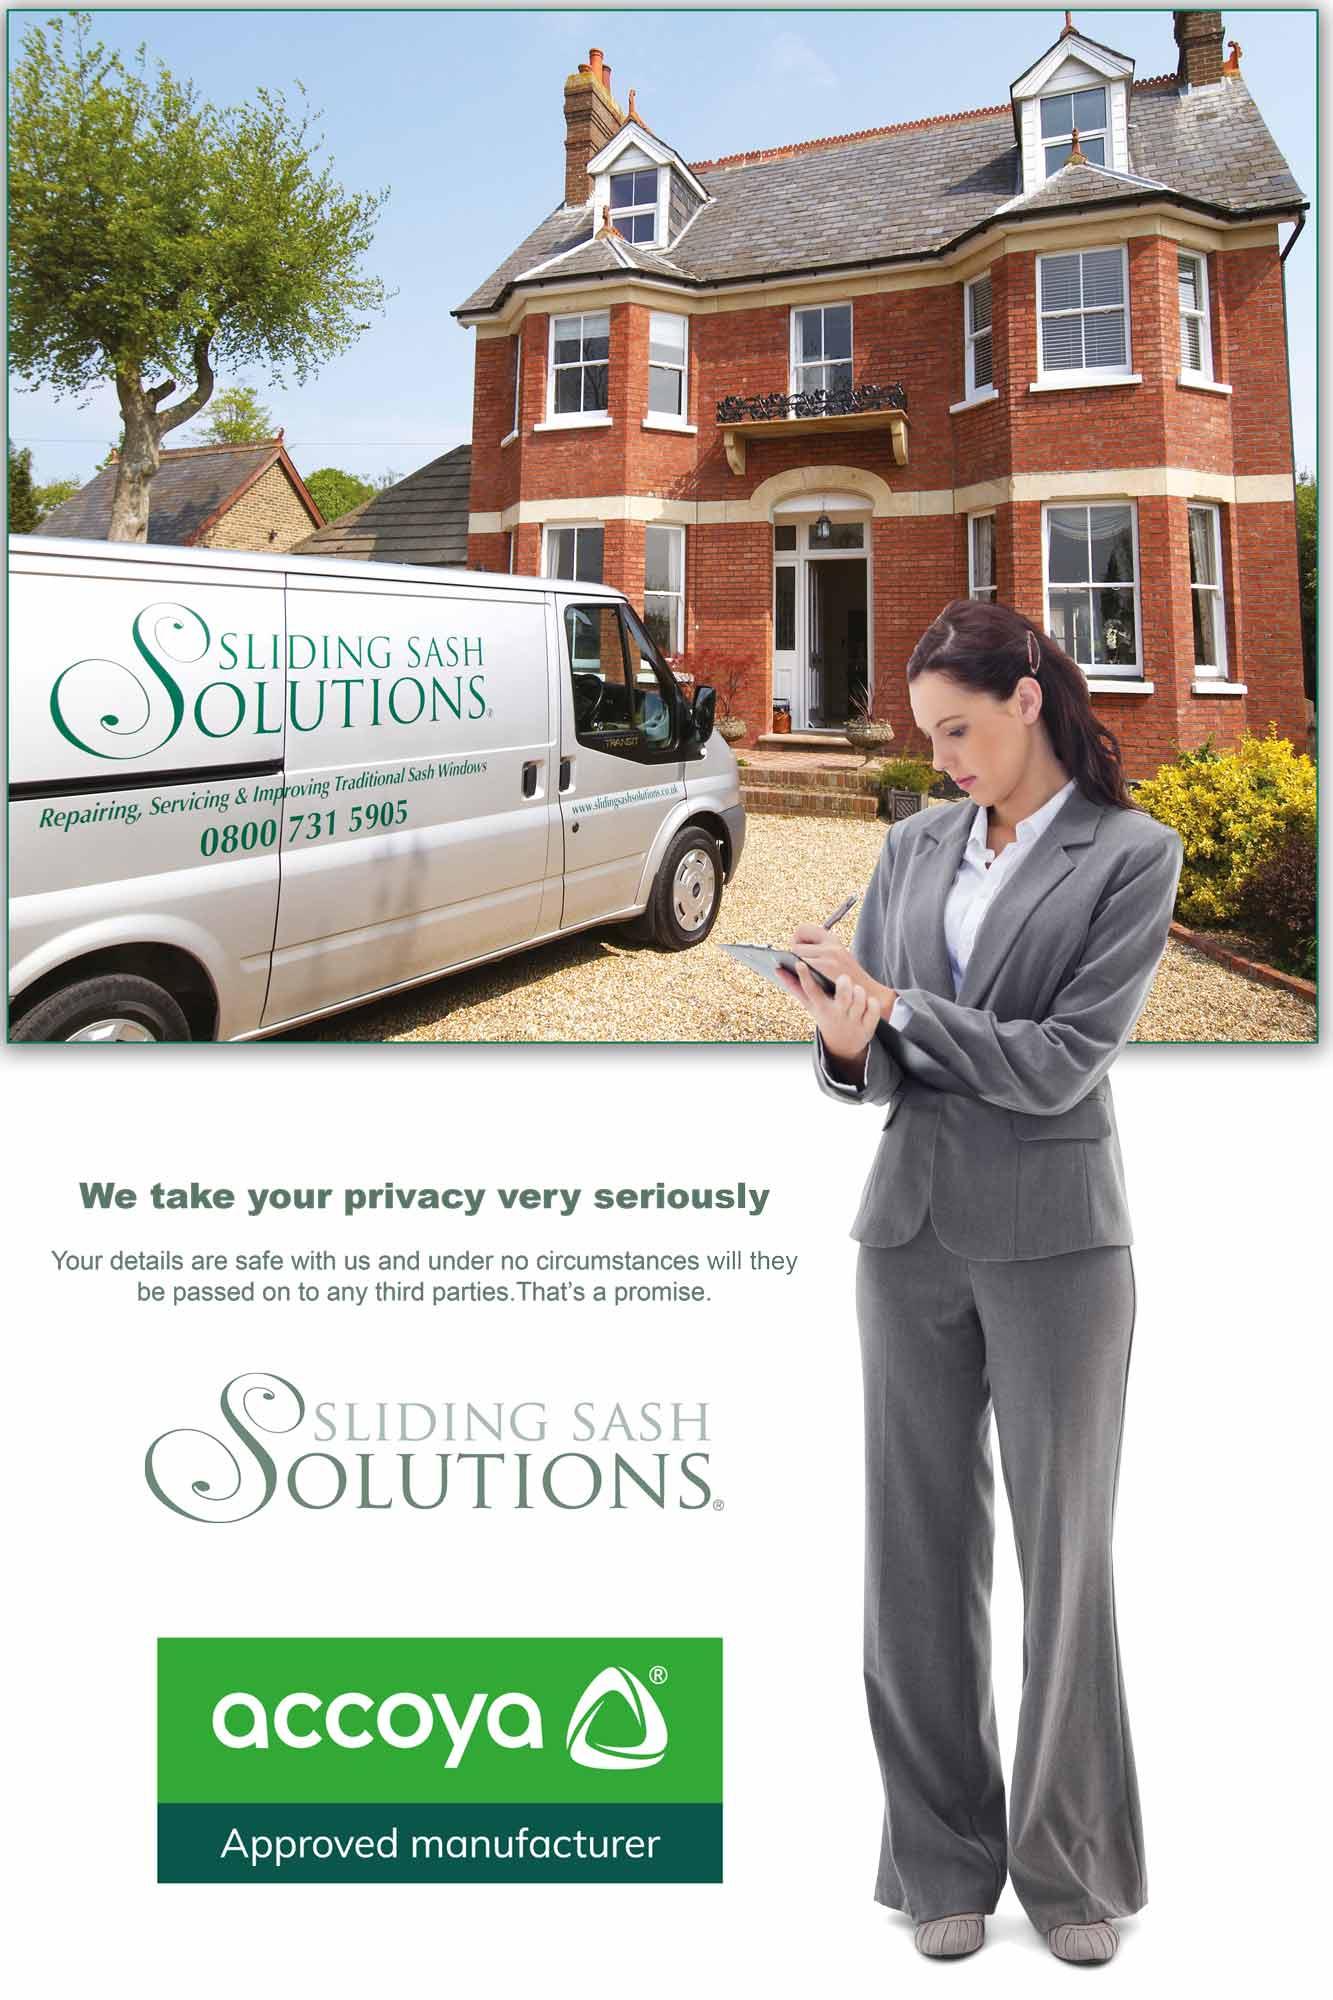 Contact Sliding Sash Solutions